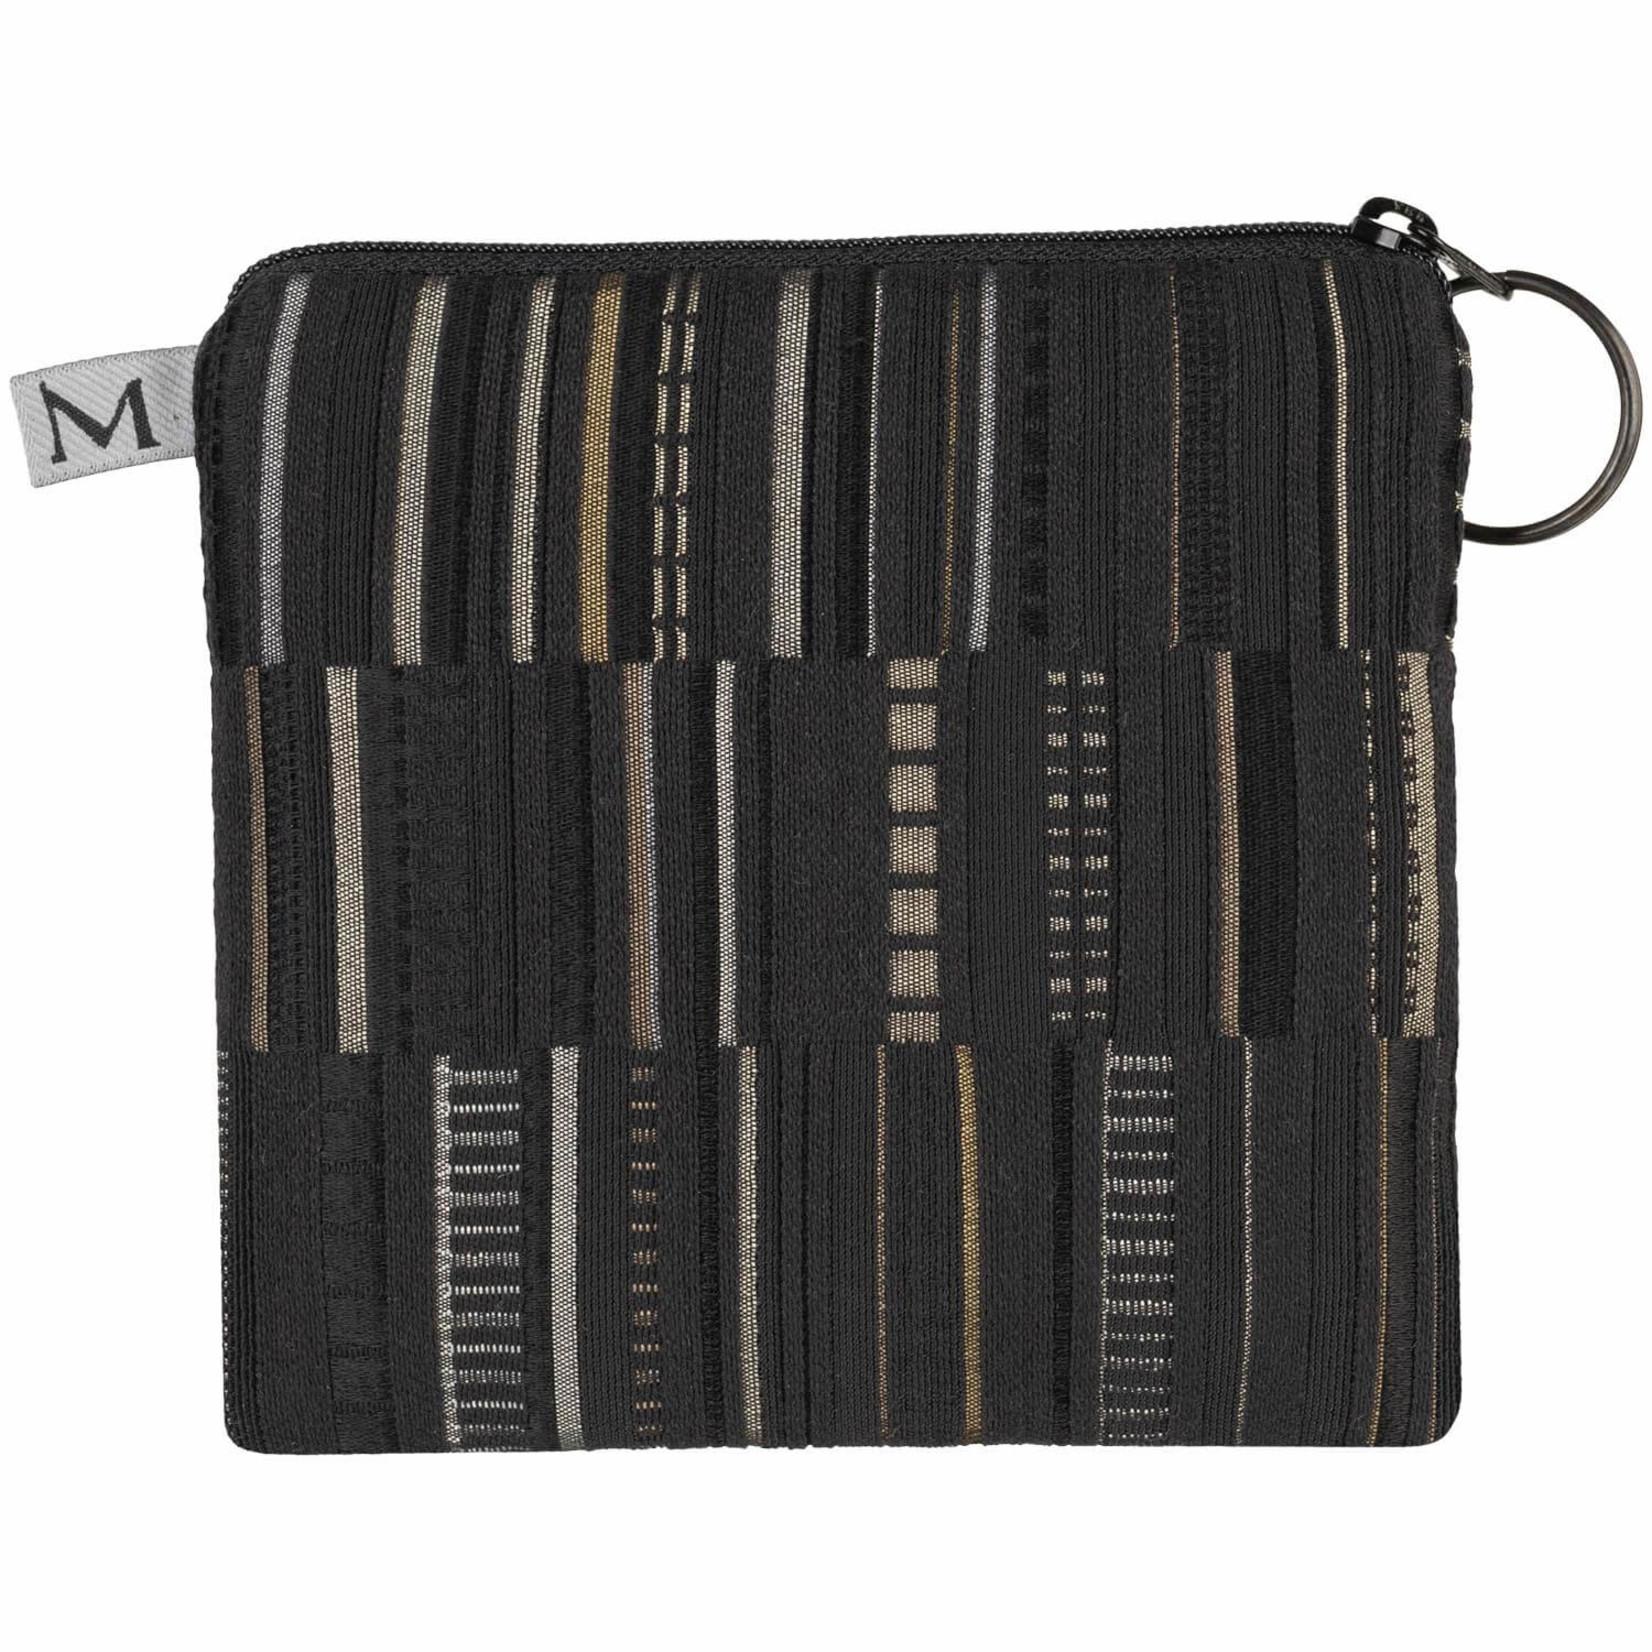 Maruca Roo Pouch FW21 - Bark Cloth Black